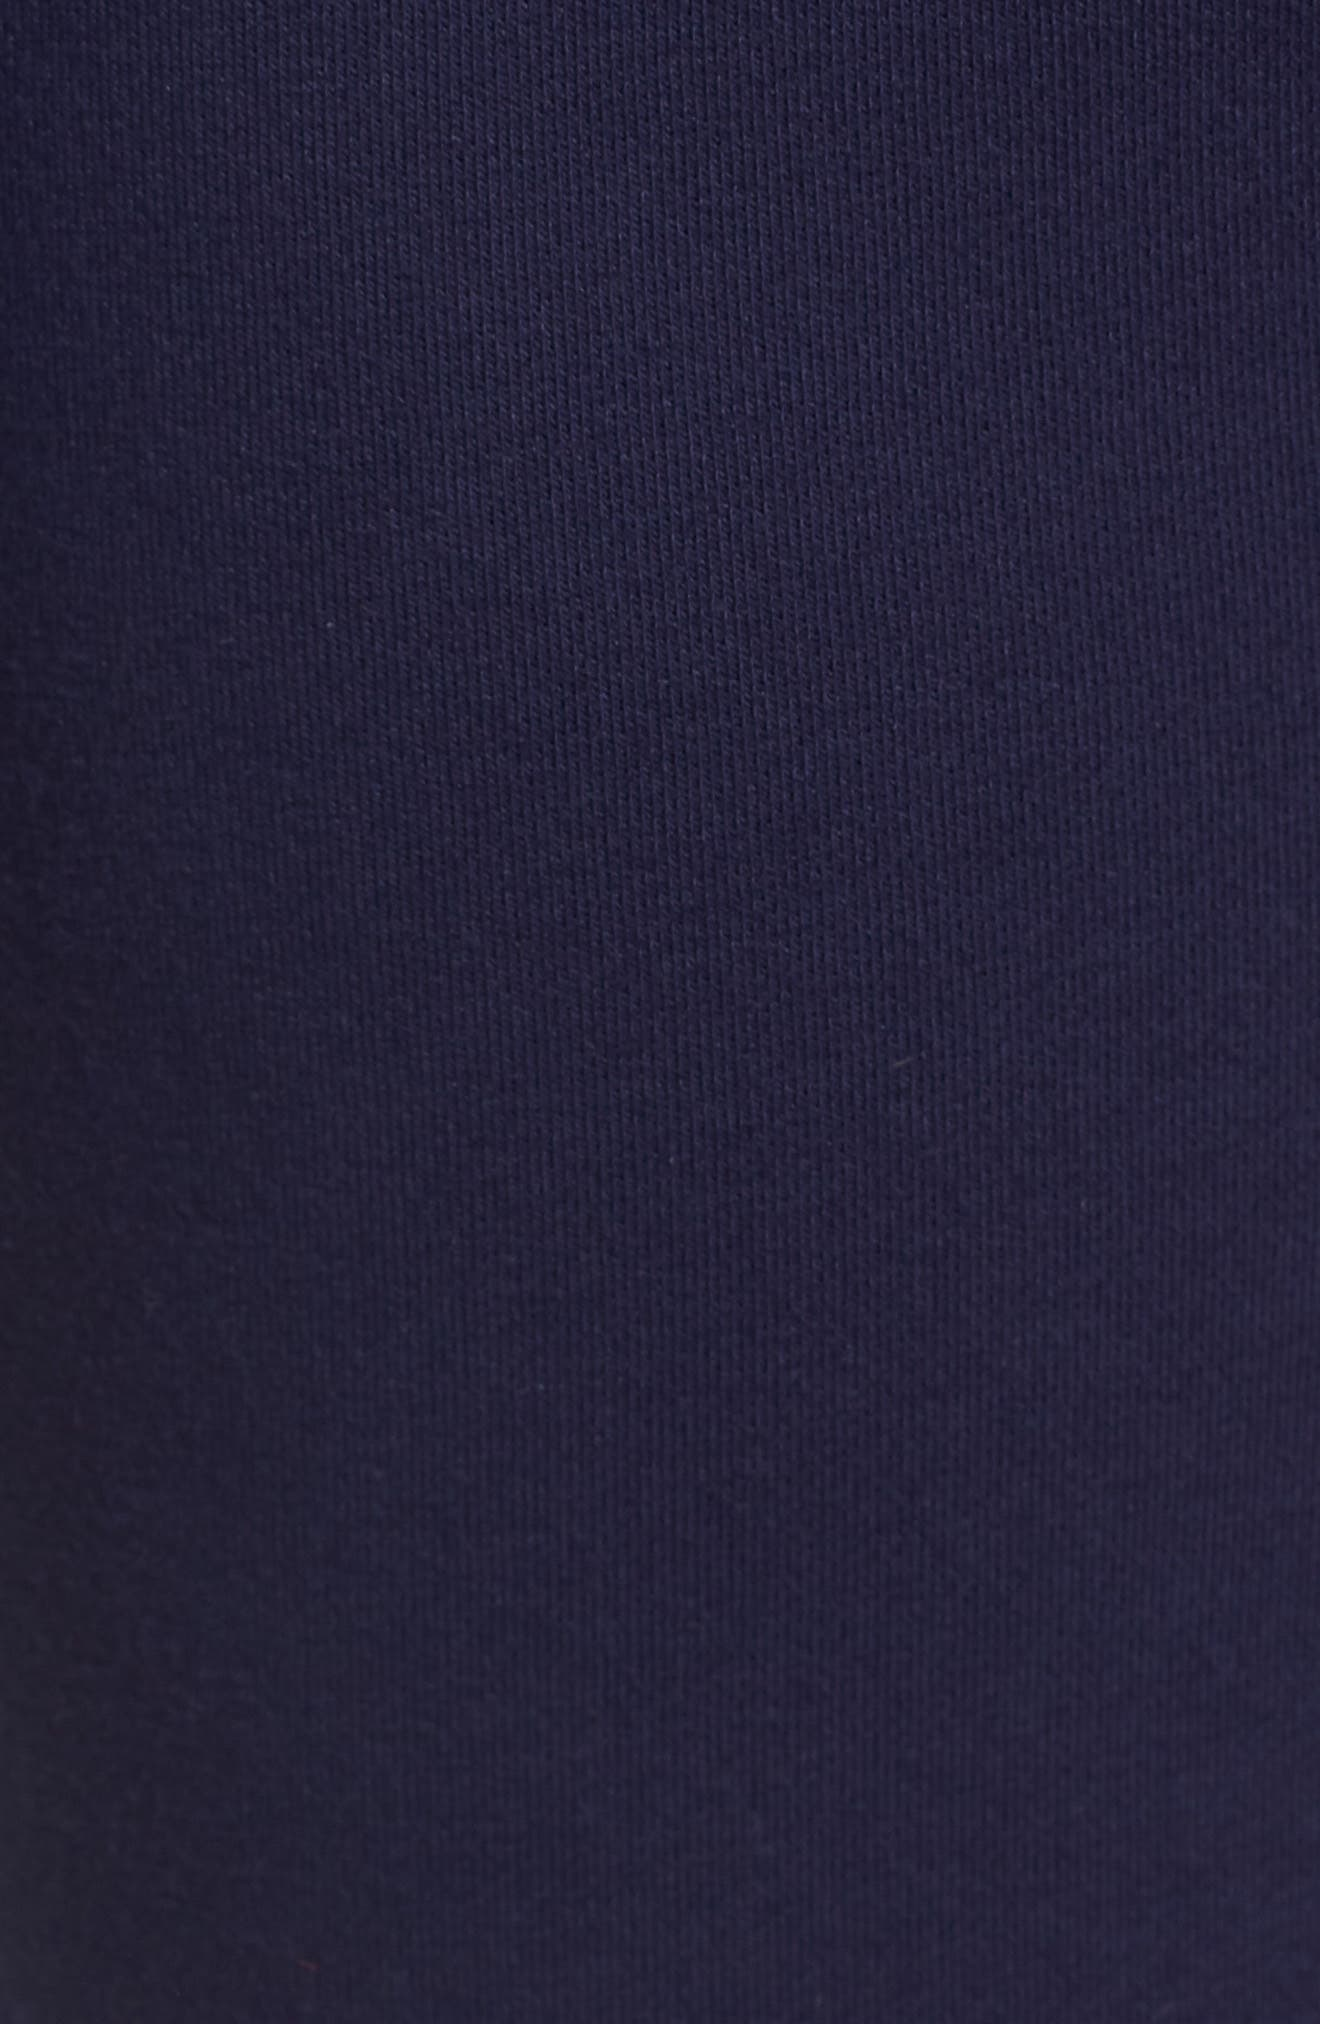 FENTY PUMA by Rihanna Lace-Up Sweatpants,                             Alternate thumbnail 5, color,                             400